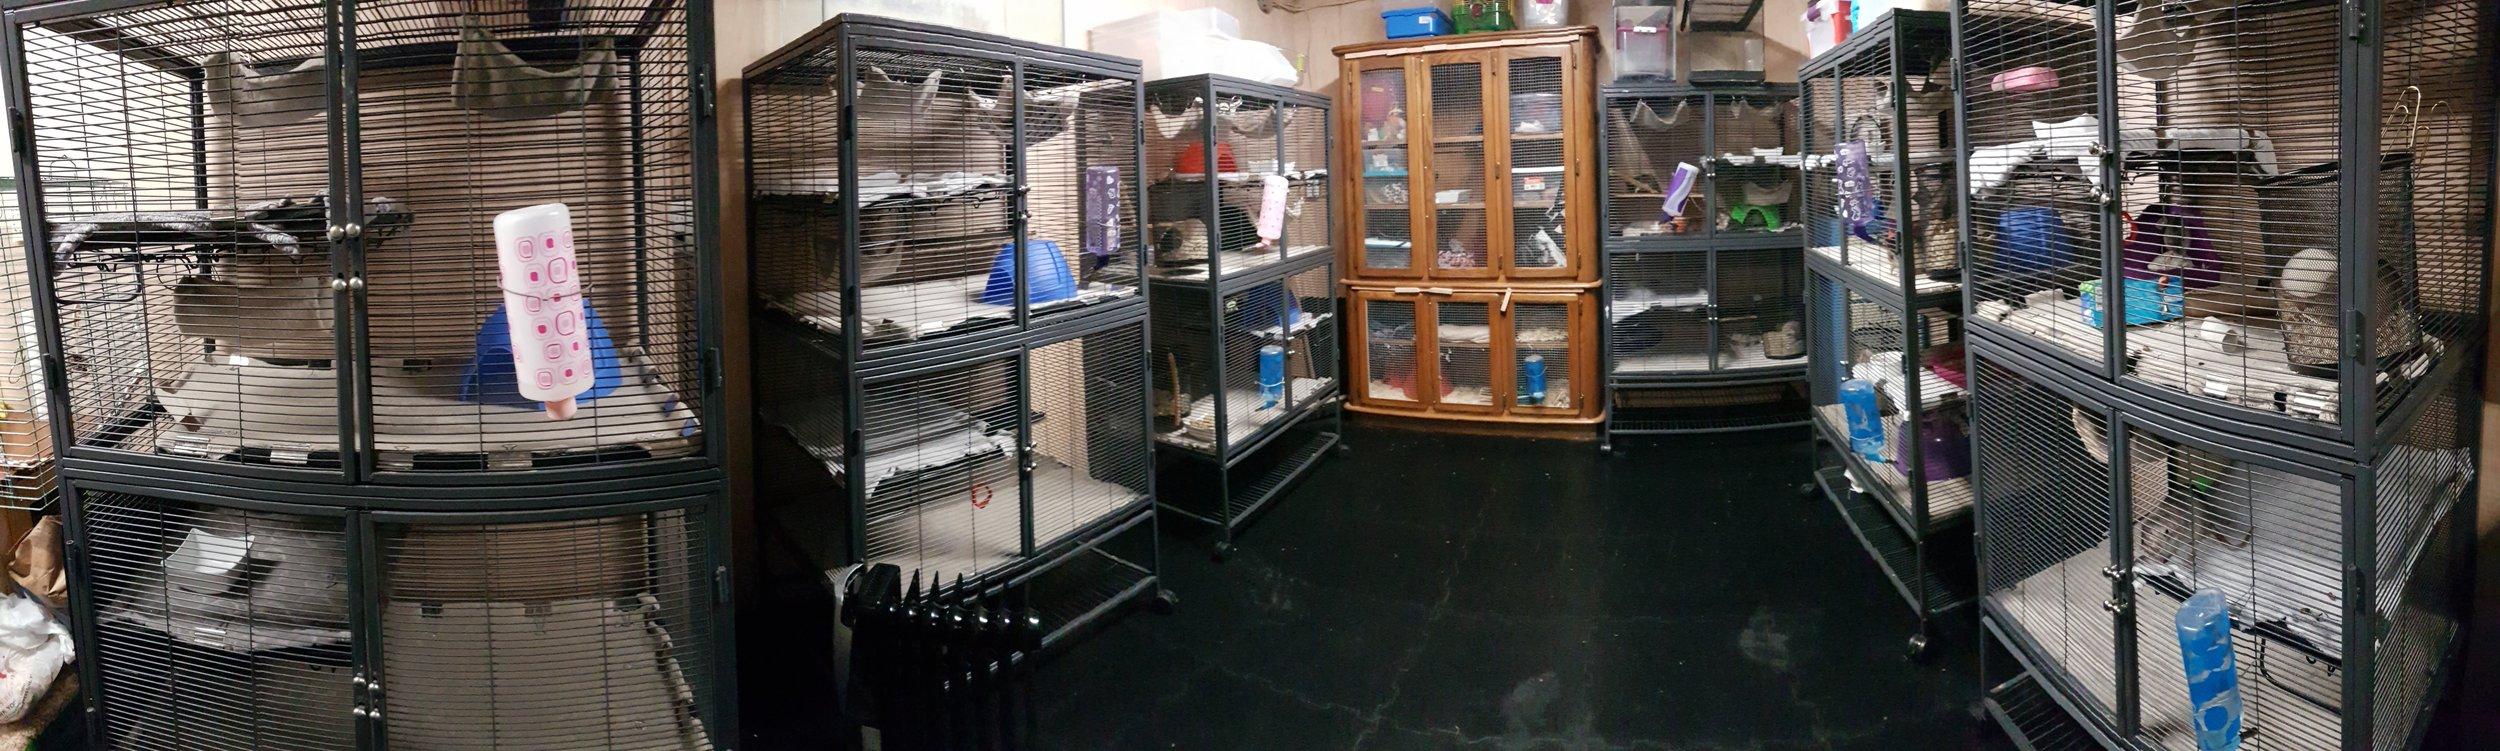 Rat Emporium Toronto - rat cages - rat breeder Toronto - rat room - pet rats